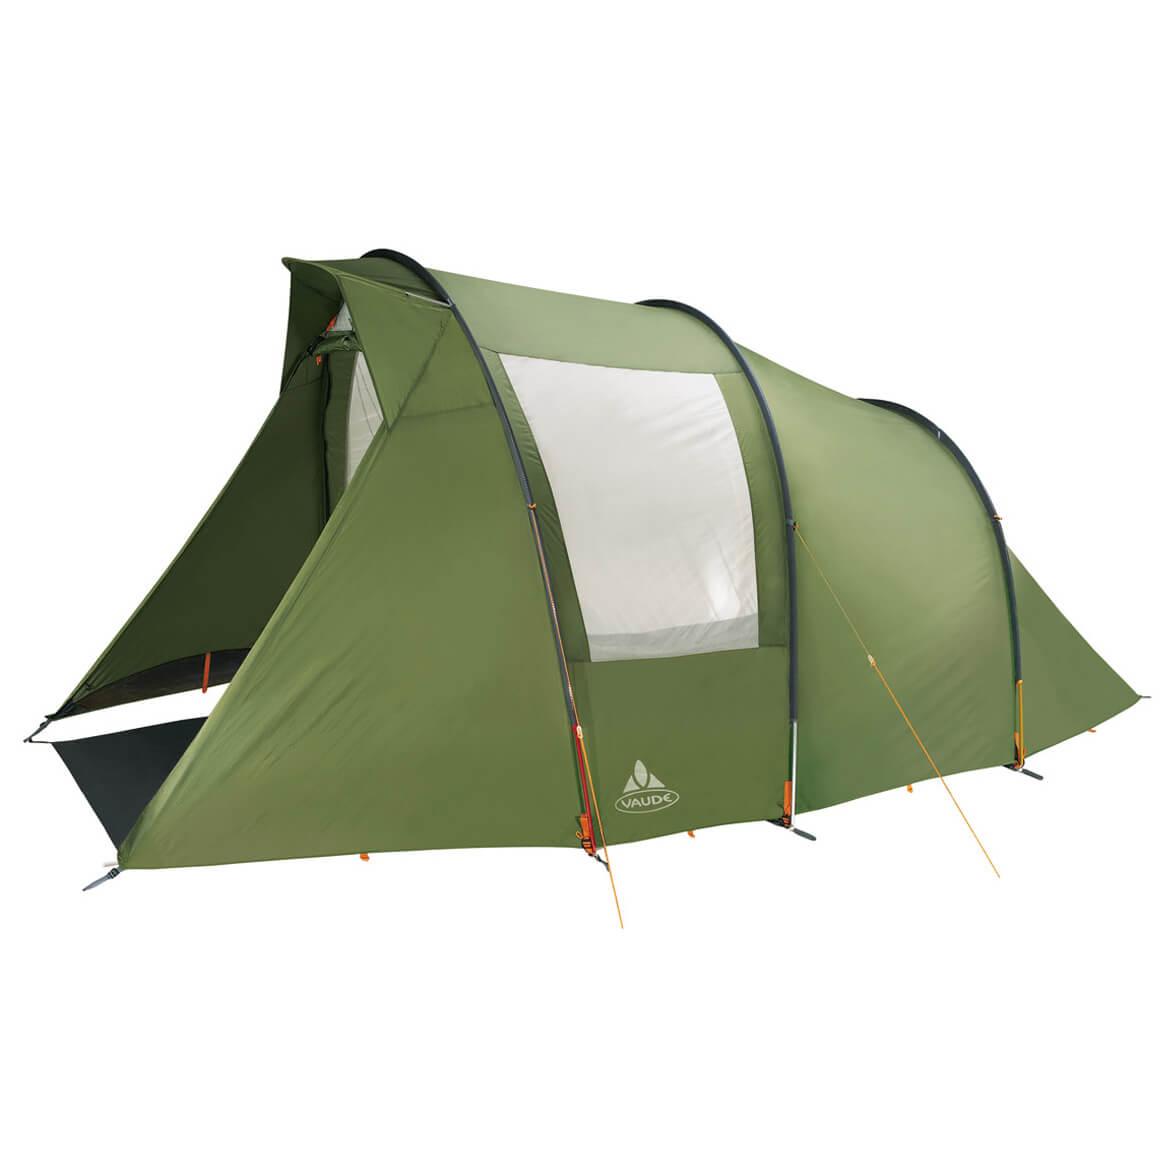 Vaude - Opera 4P - 4-person tent ...  sc 1 st  Alpinetrek & Vaude Opera 4P - 4-Person Tent | Buy online | Alpinetrek.co.uk